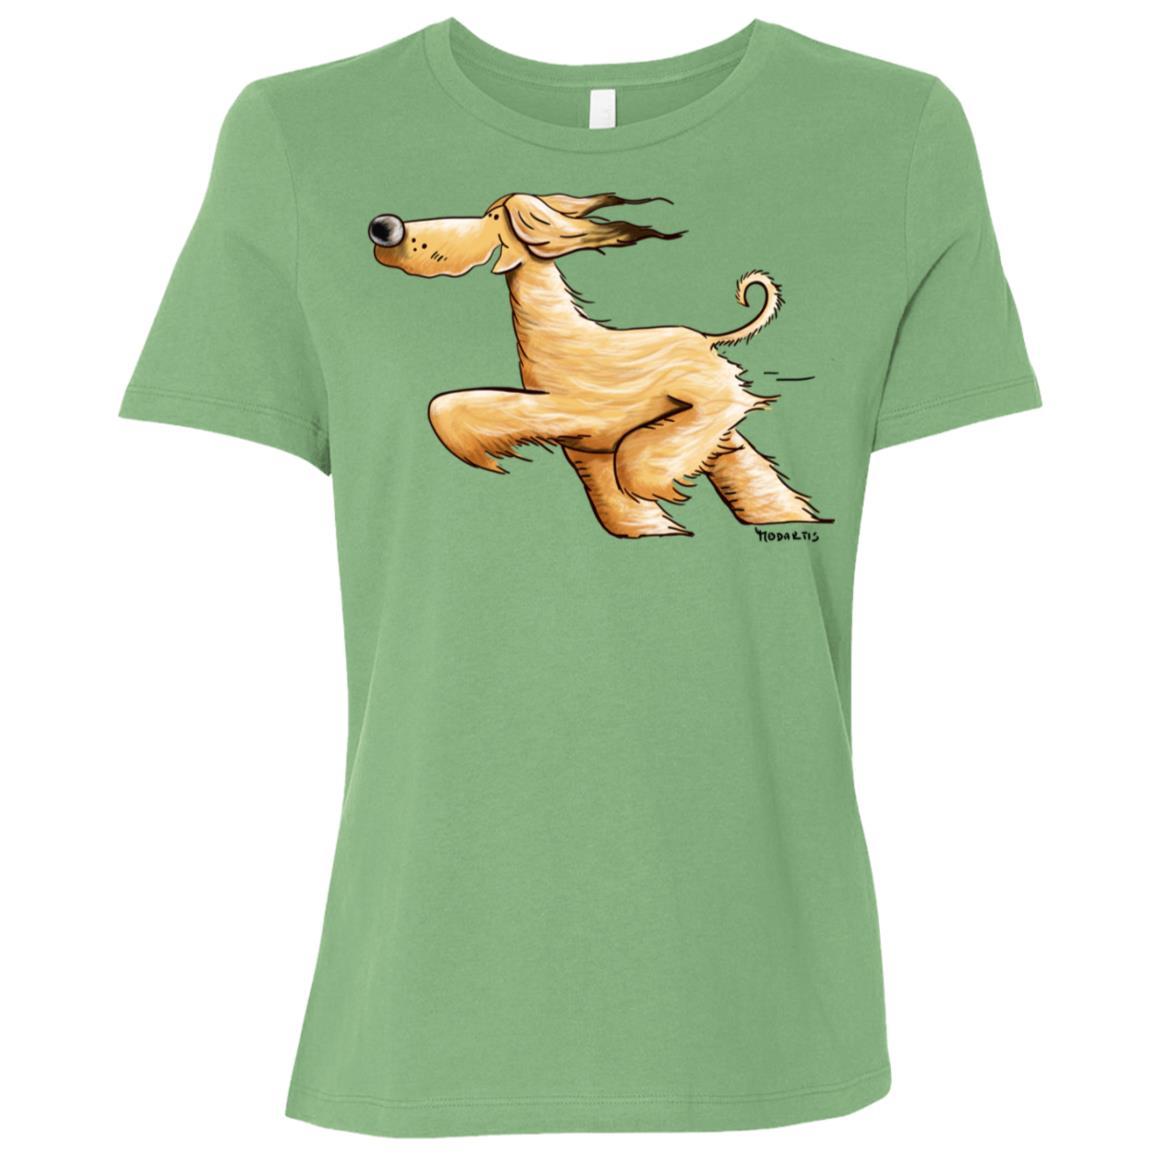 Awesome Running Afghan Hound Women Short Sleeve T-Shirt